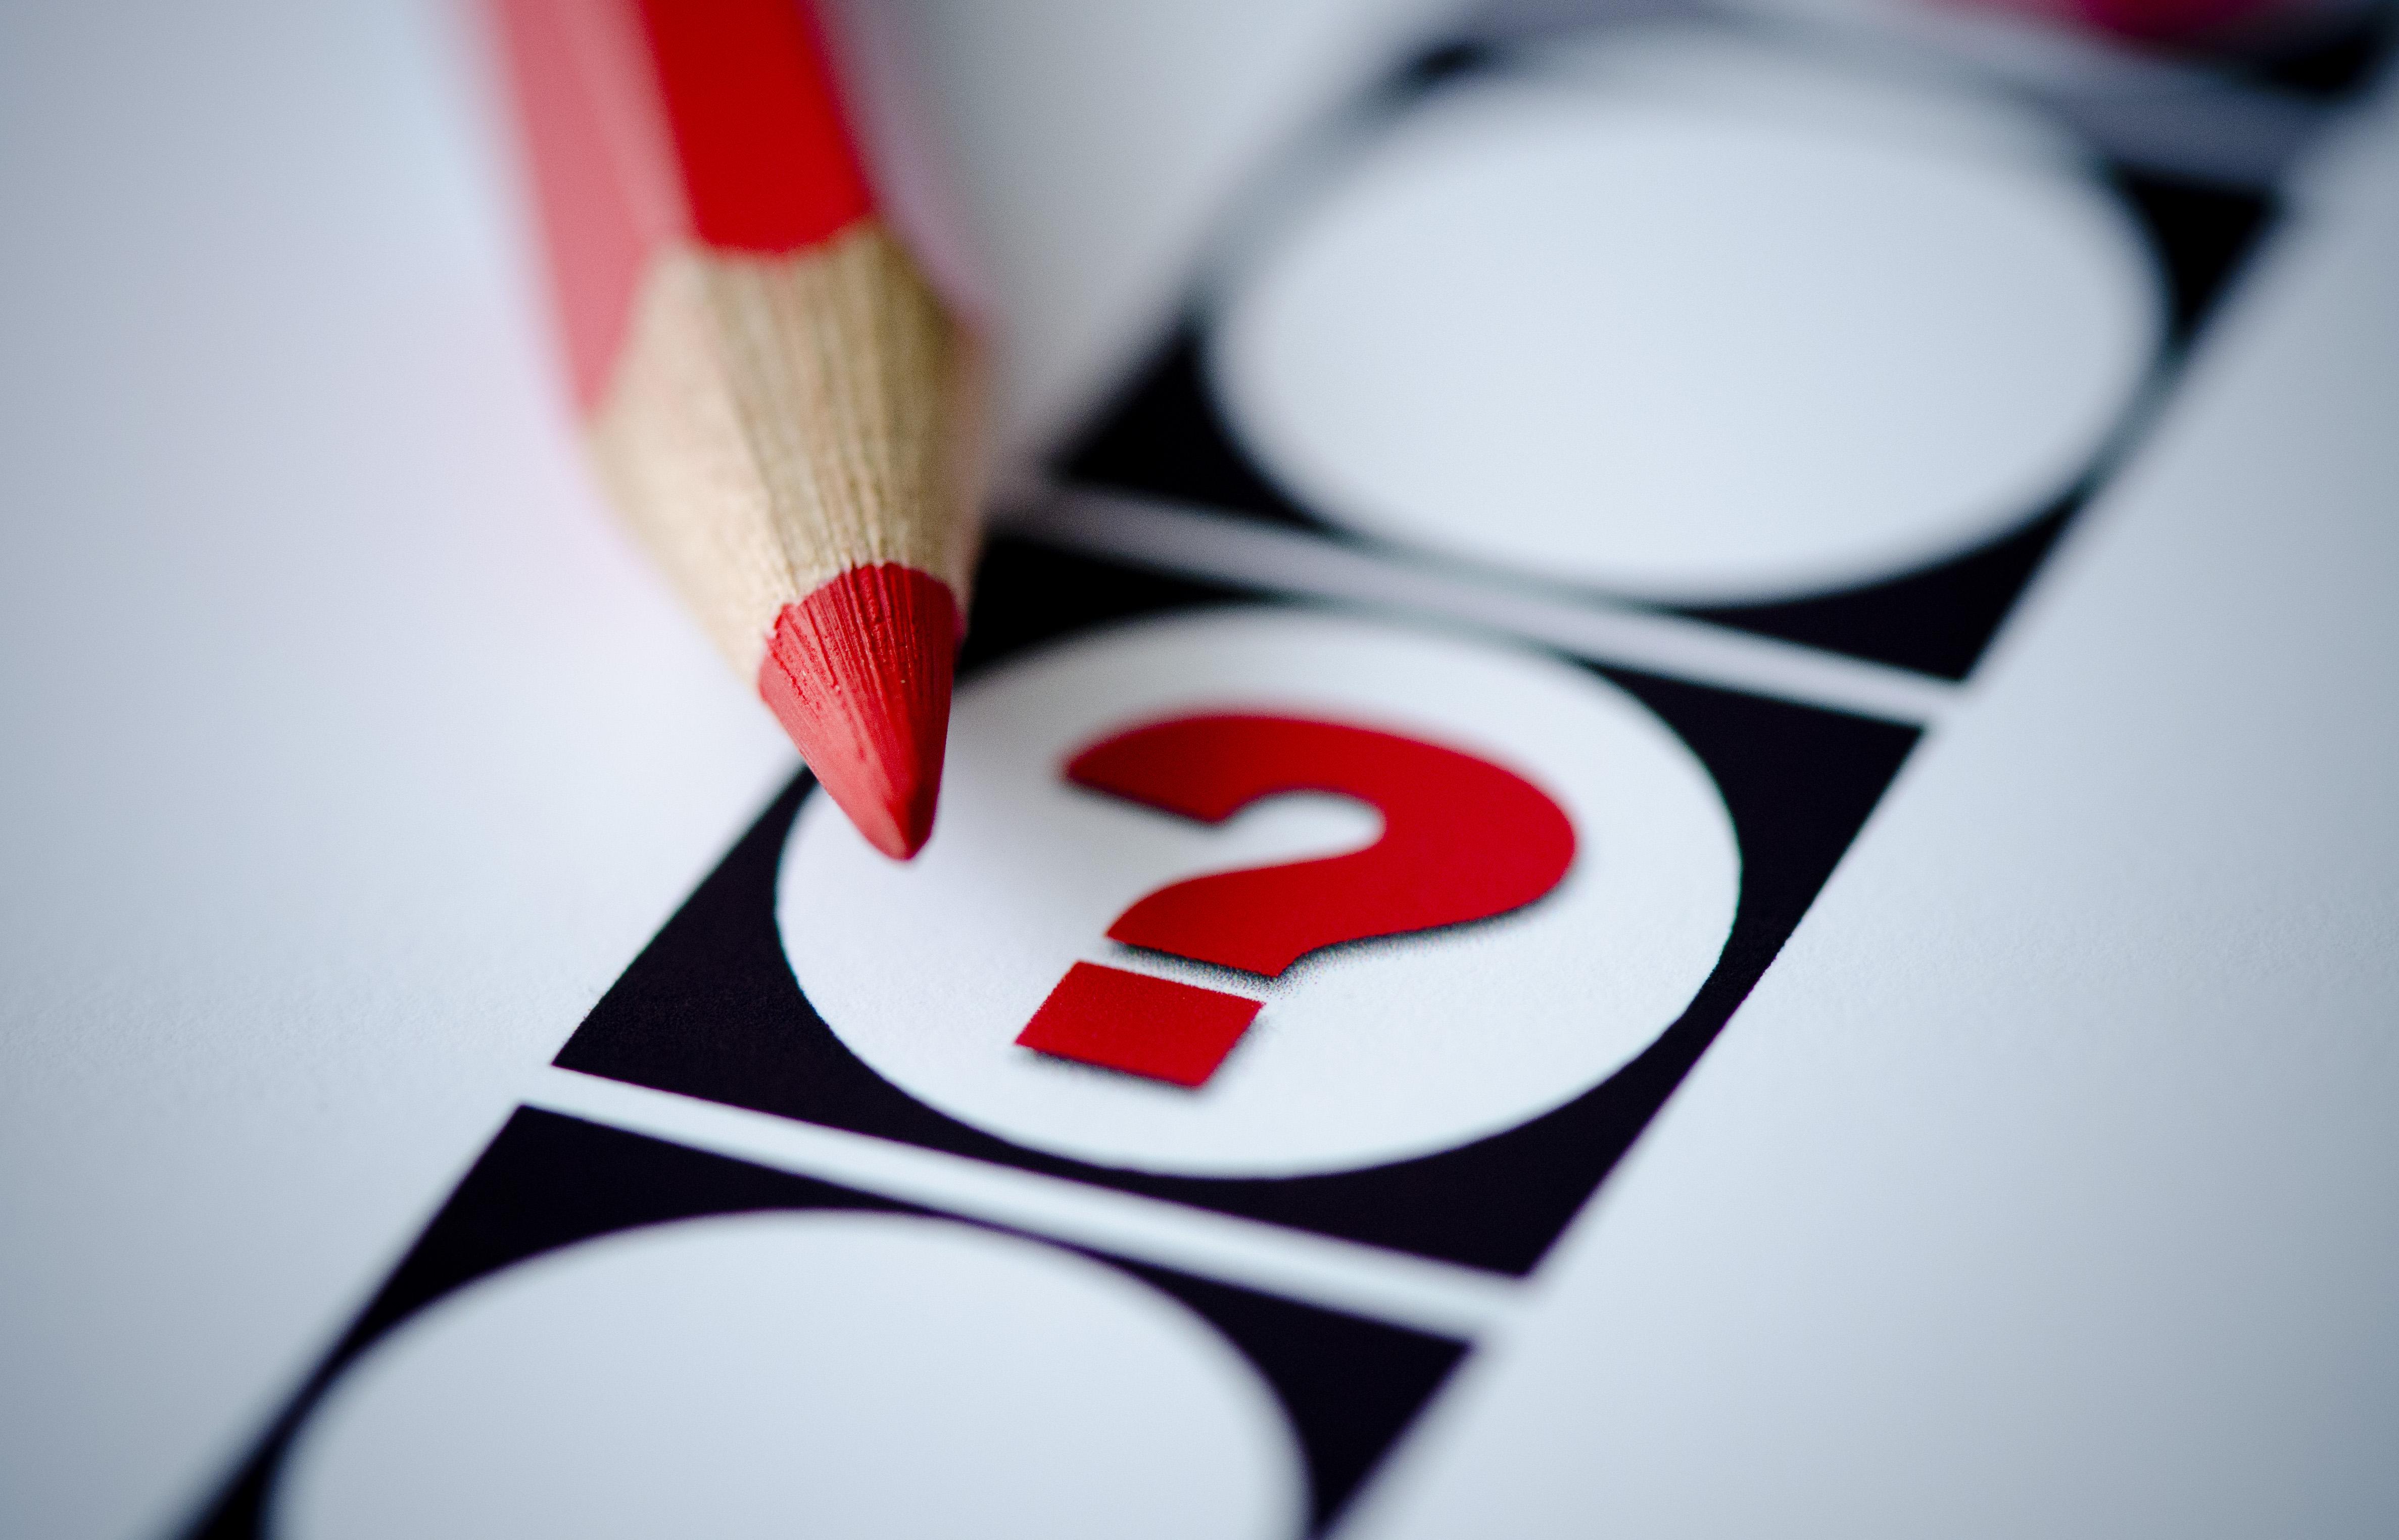 Stemmen verkiezingen: wie te kiezen?